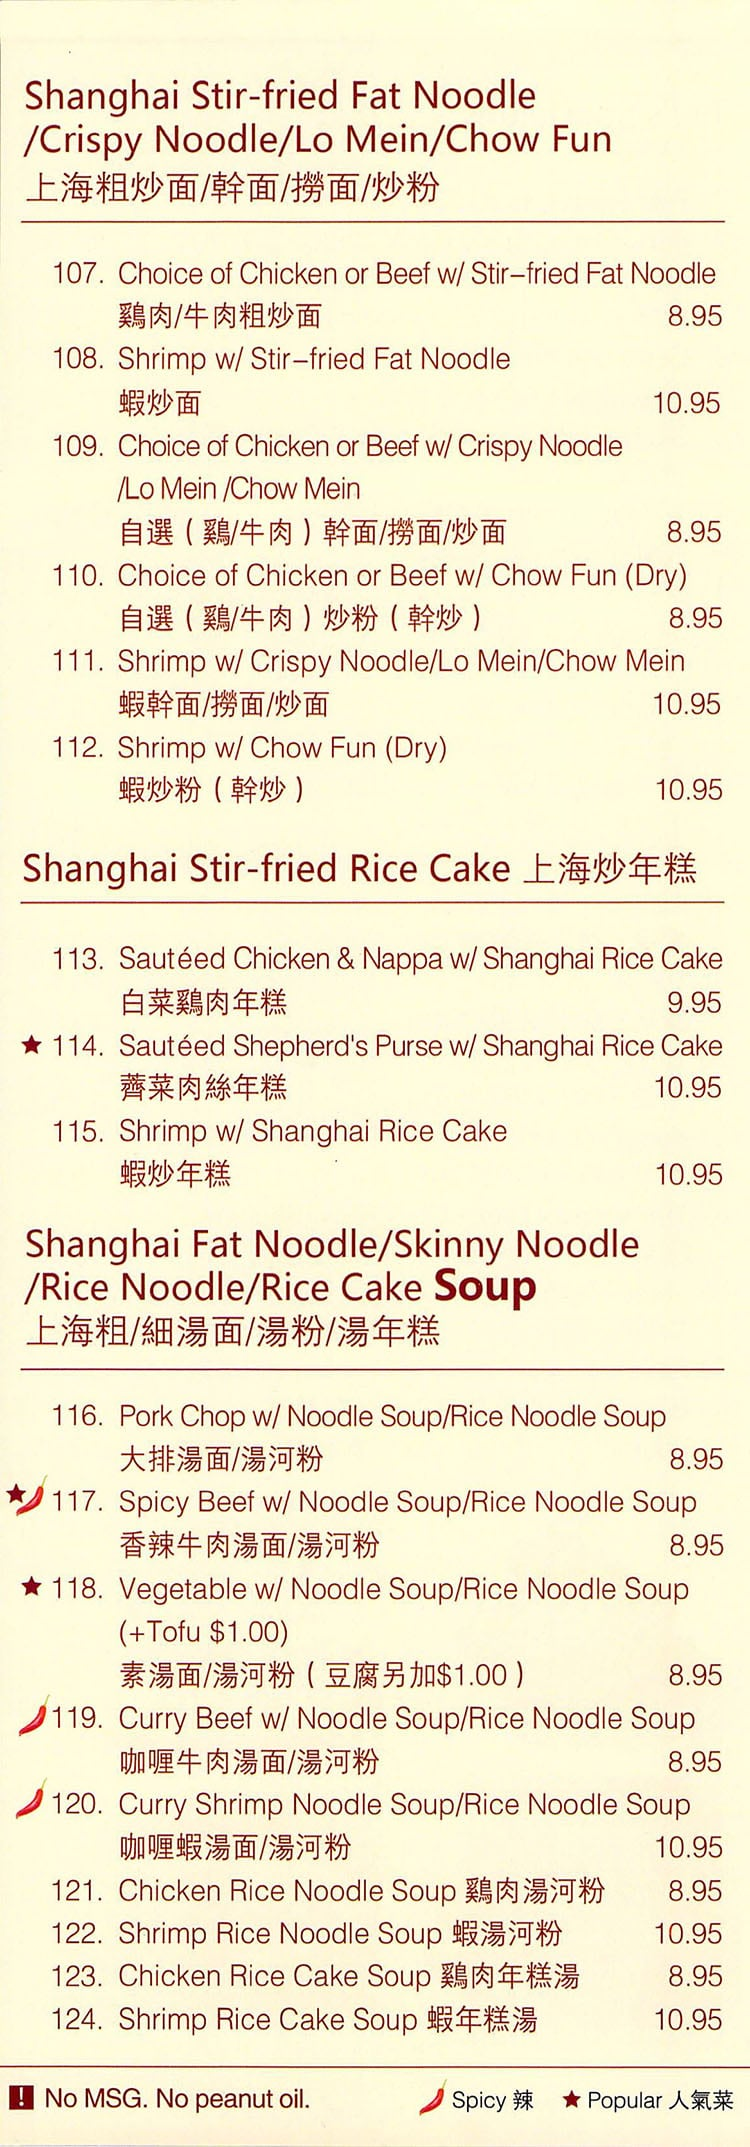 Boba World menu - noodles, rice cakes